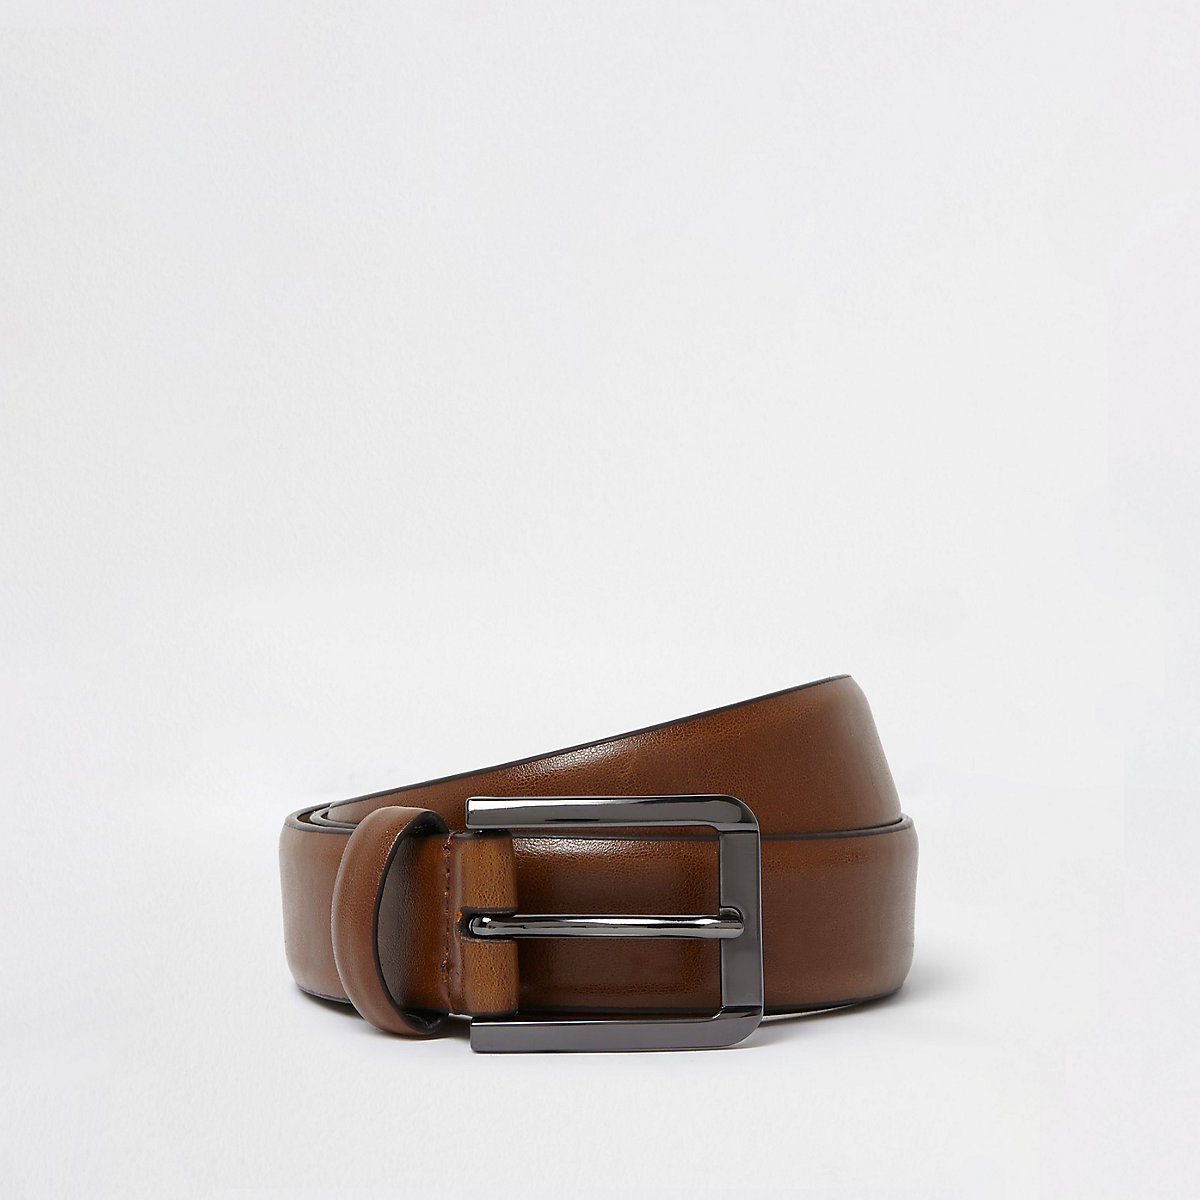 Tan brown smart belt